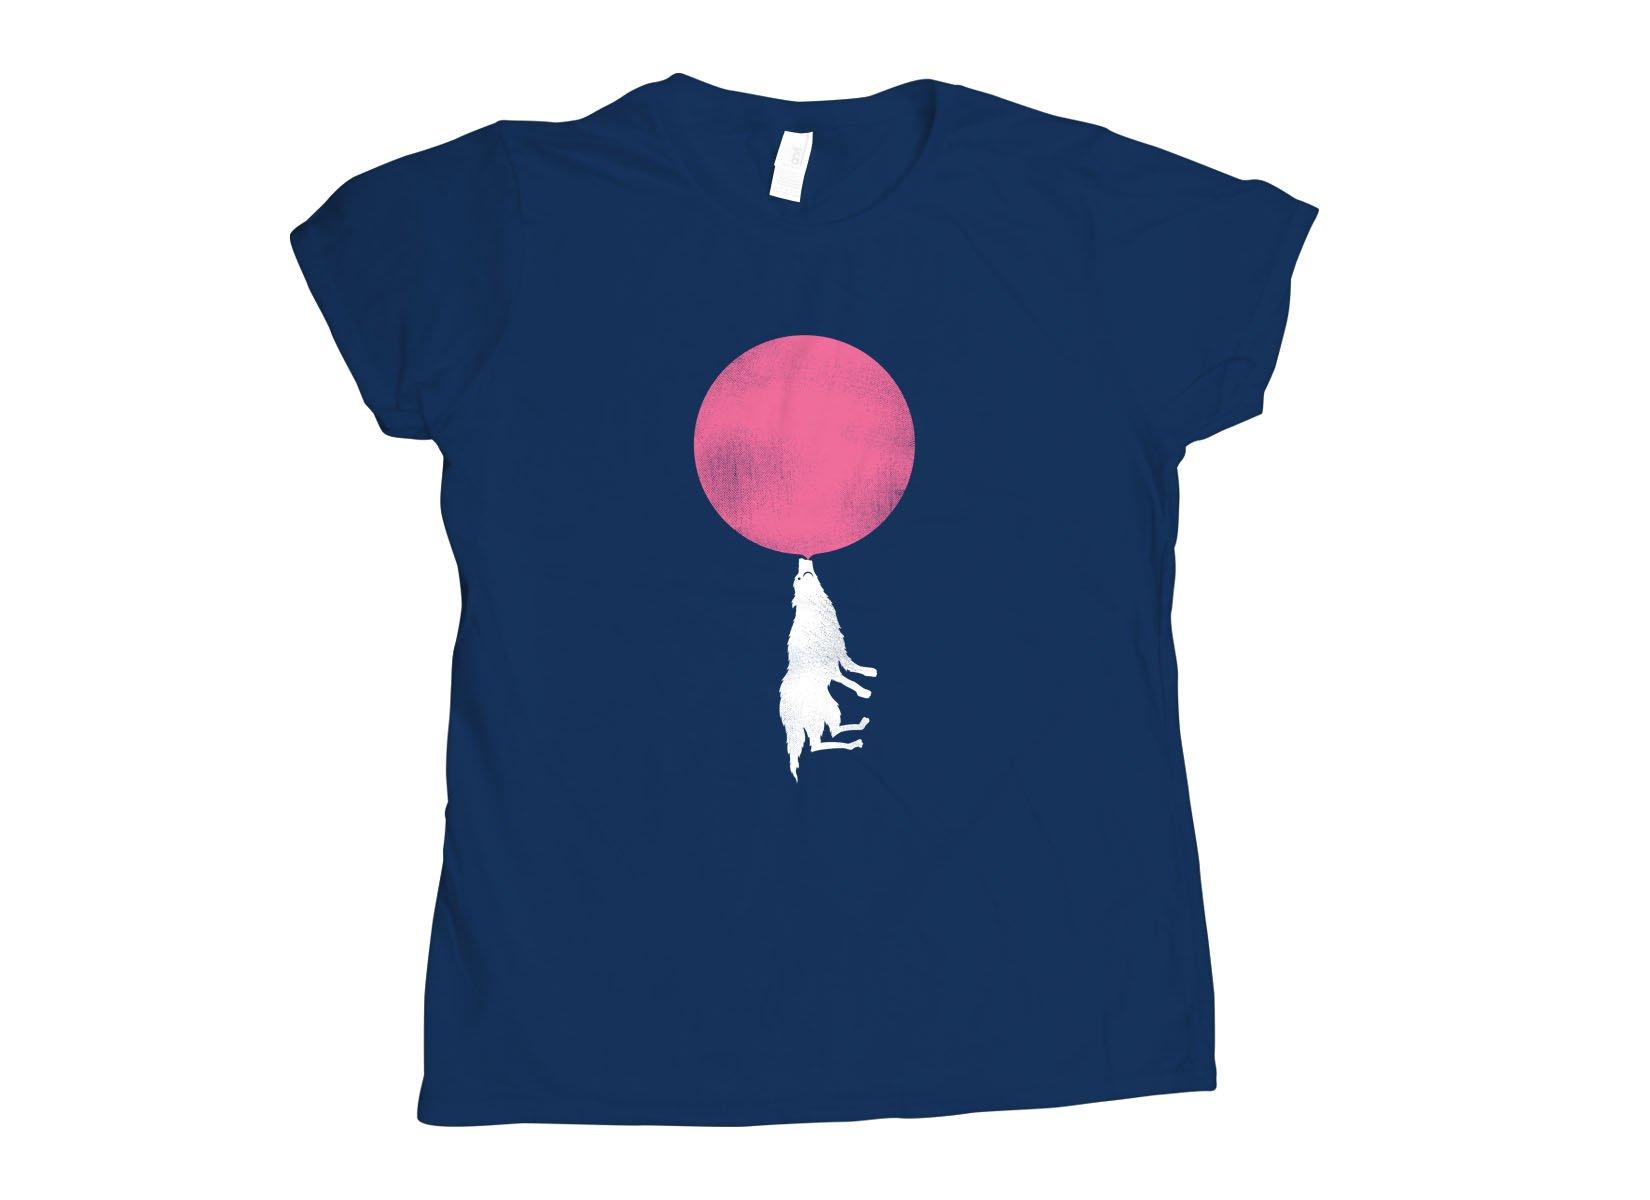 Bubble Moon on Womens T-Shirt